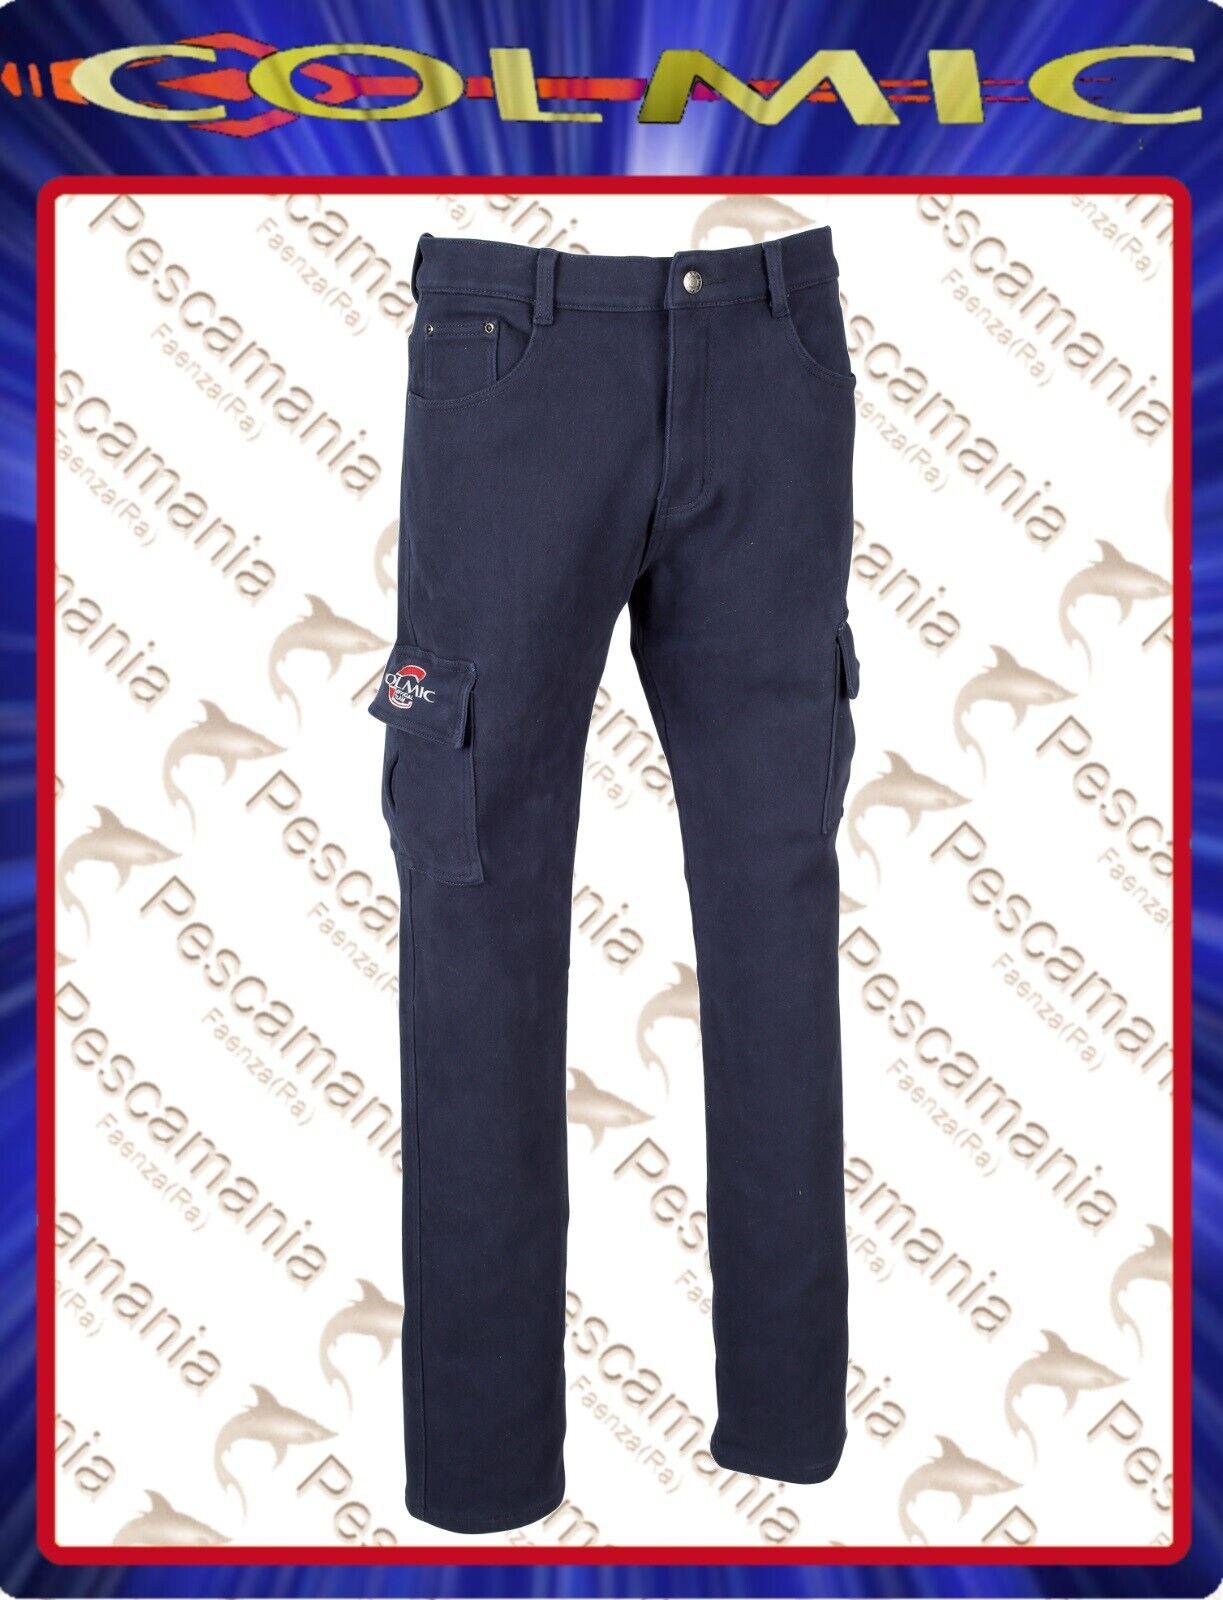 Pantalón Colmic blu para invierno Official squadra membrana de pile